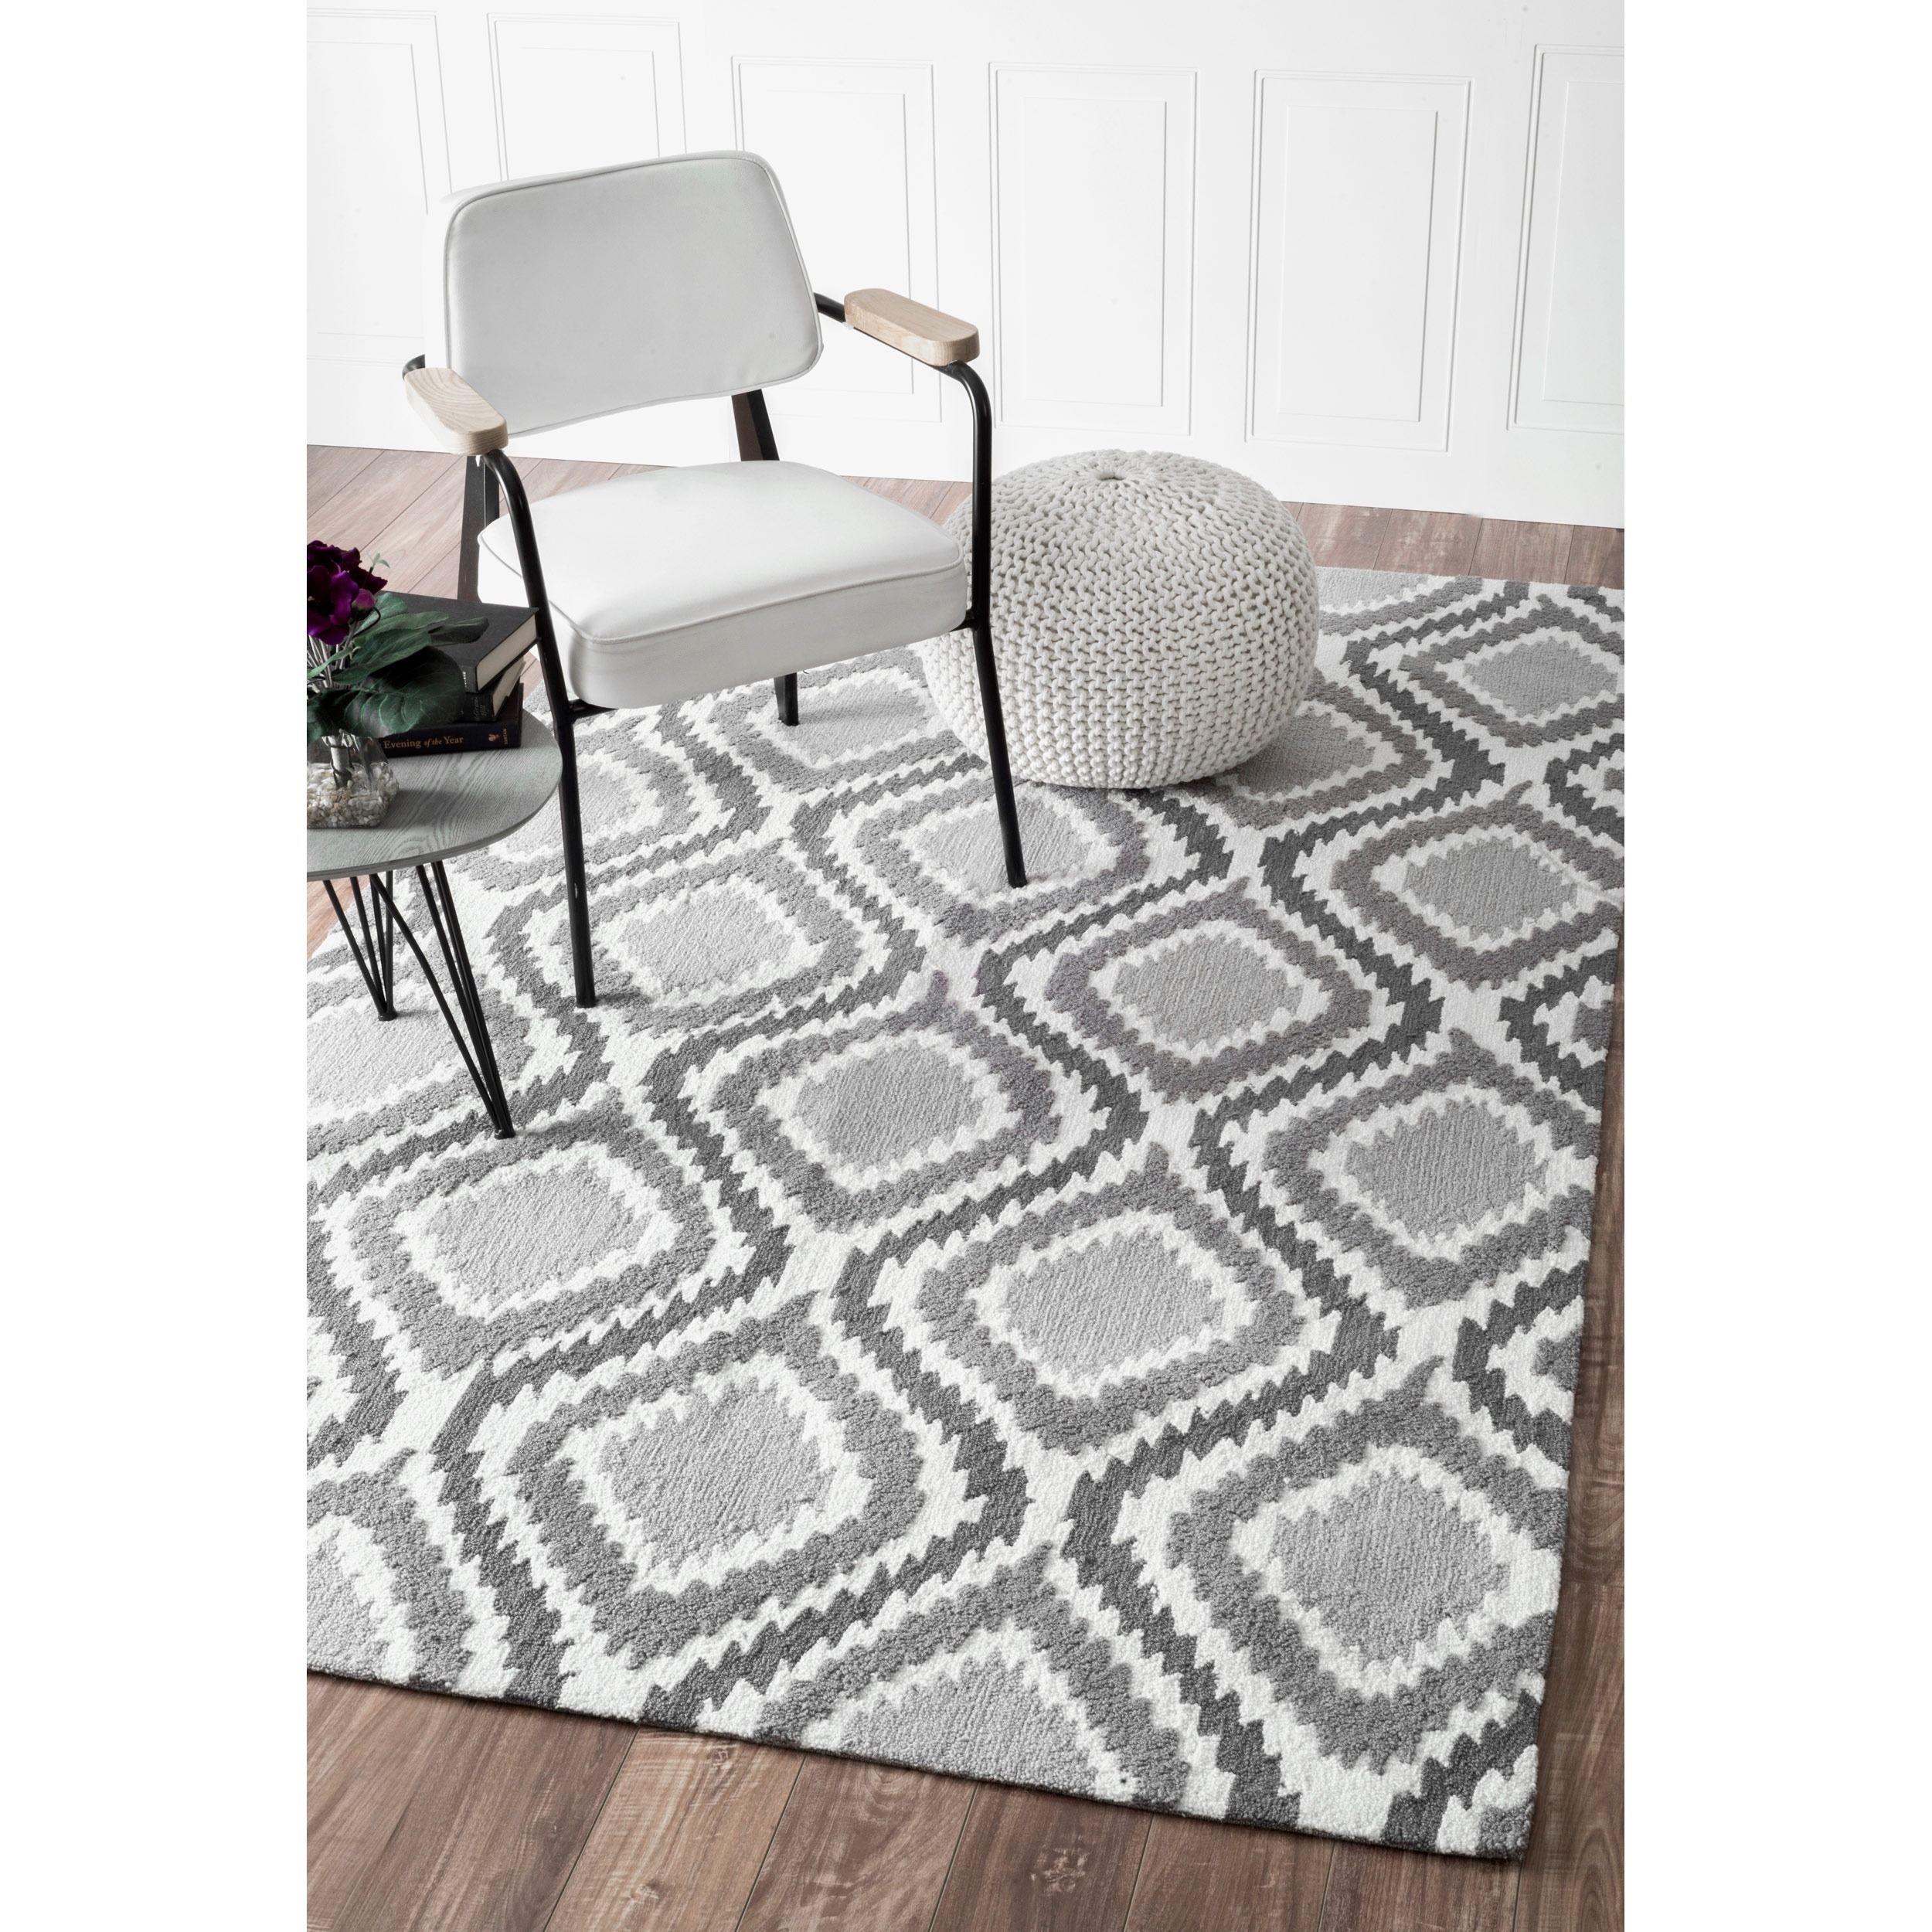 Nuloom Handmade Trellis Modern Ikat Wool Area Rug 7 6 X 9 Ping The Best Deals On 7x9 10x14 Rugs